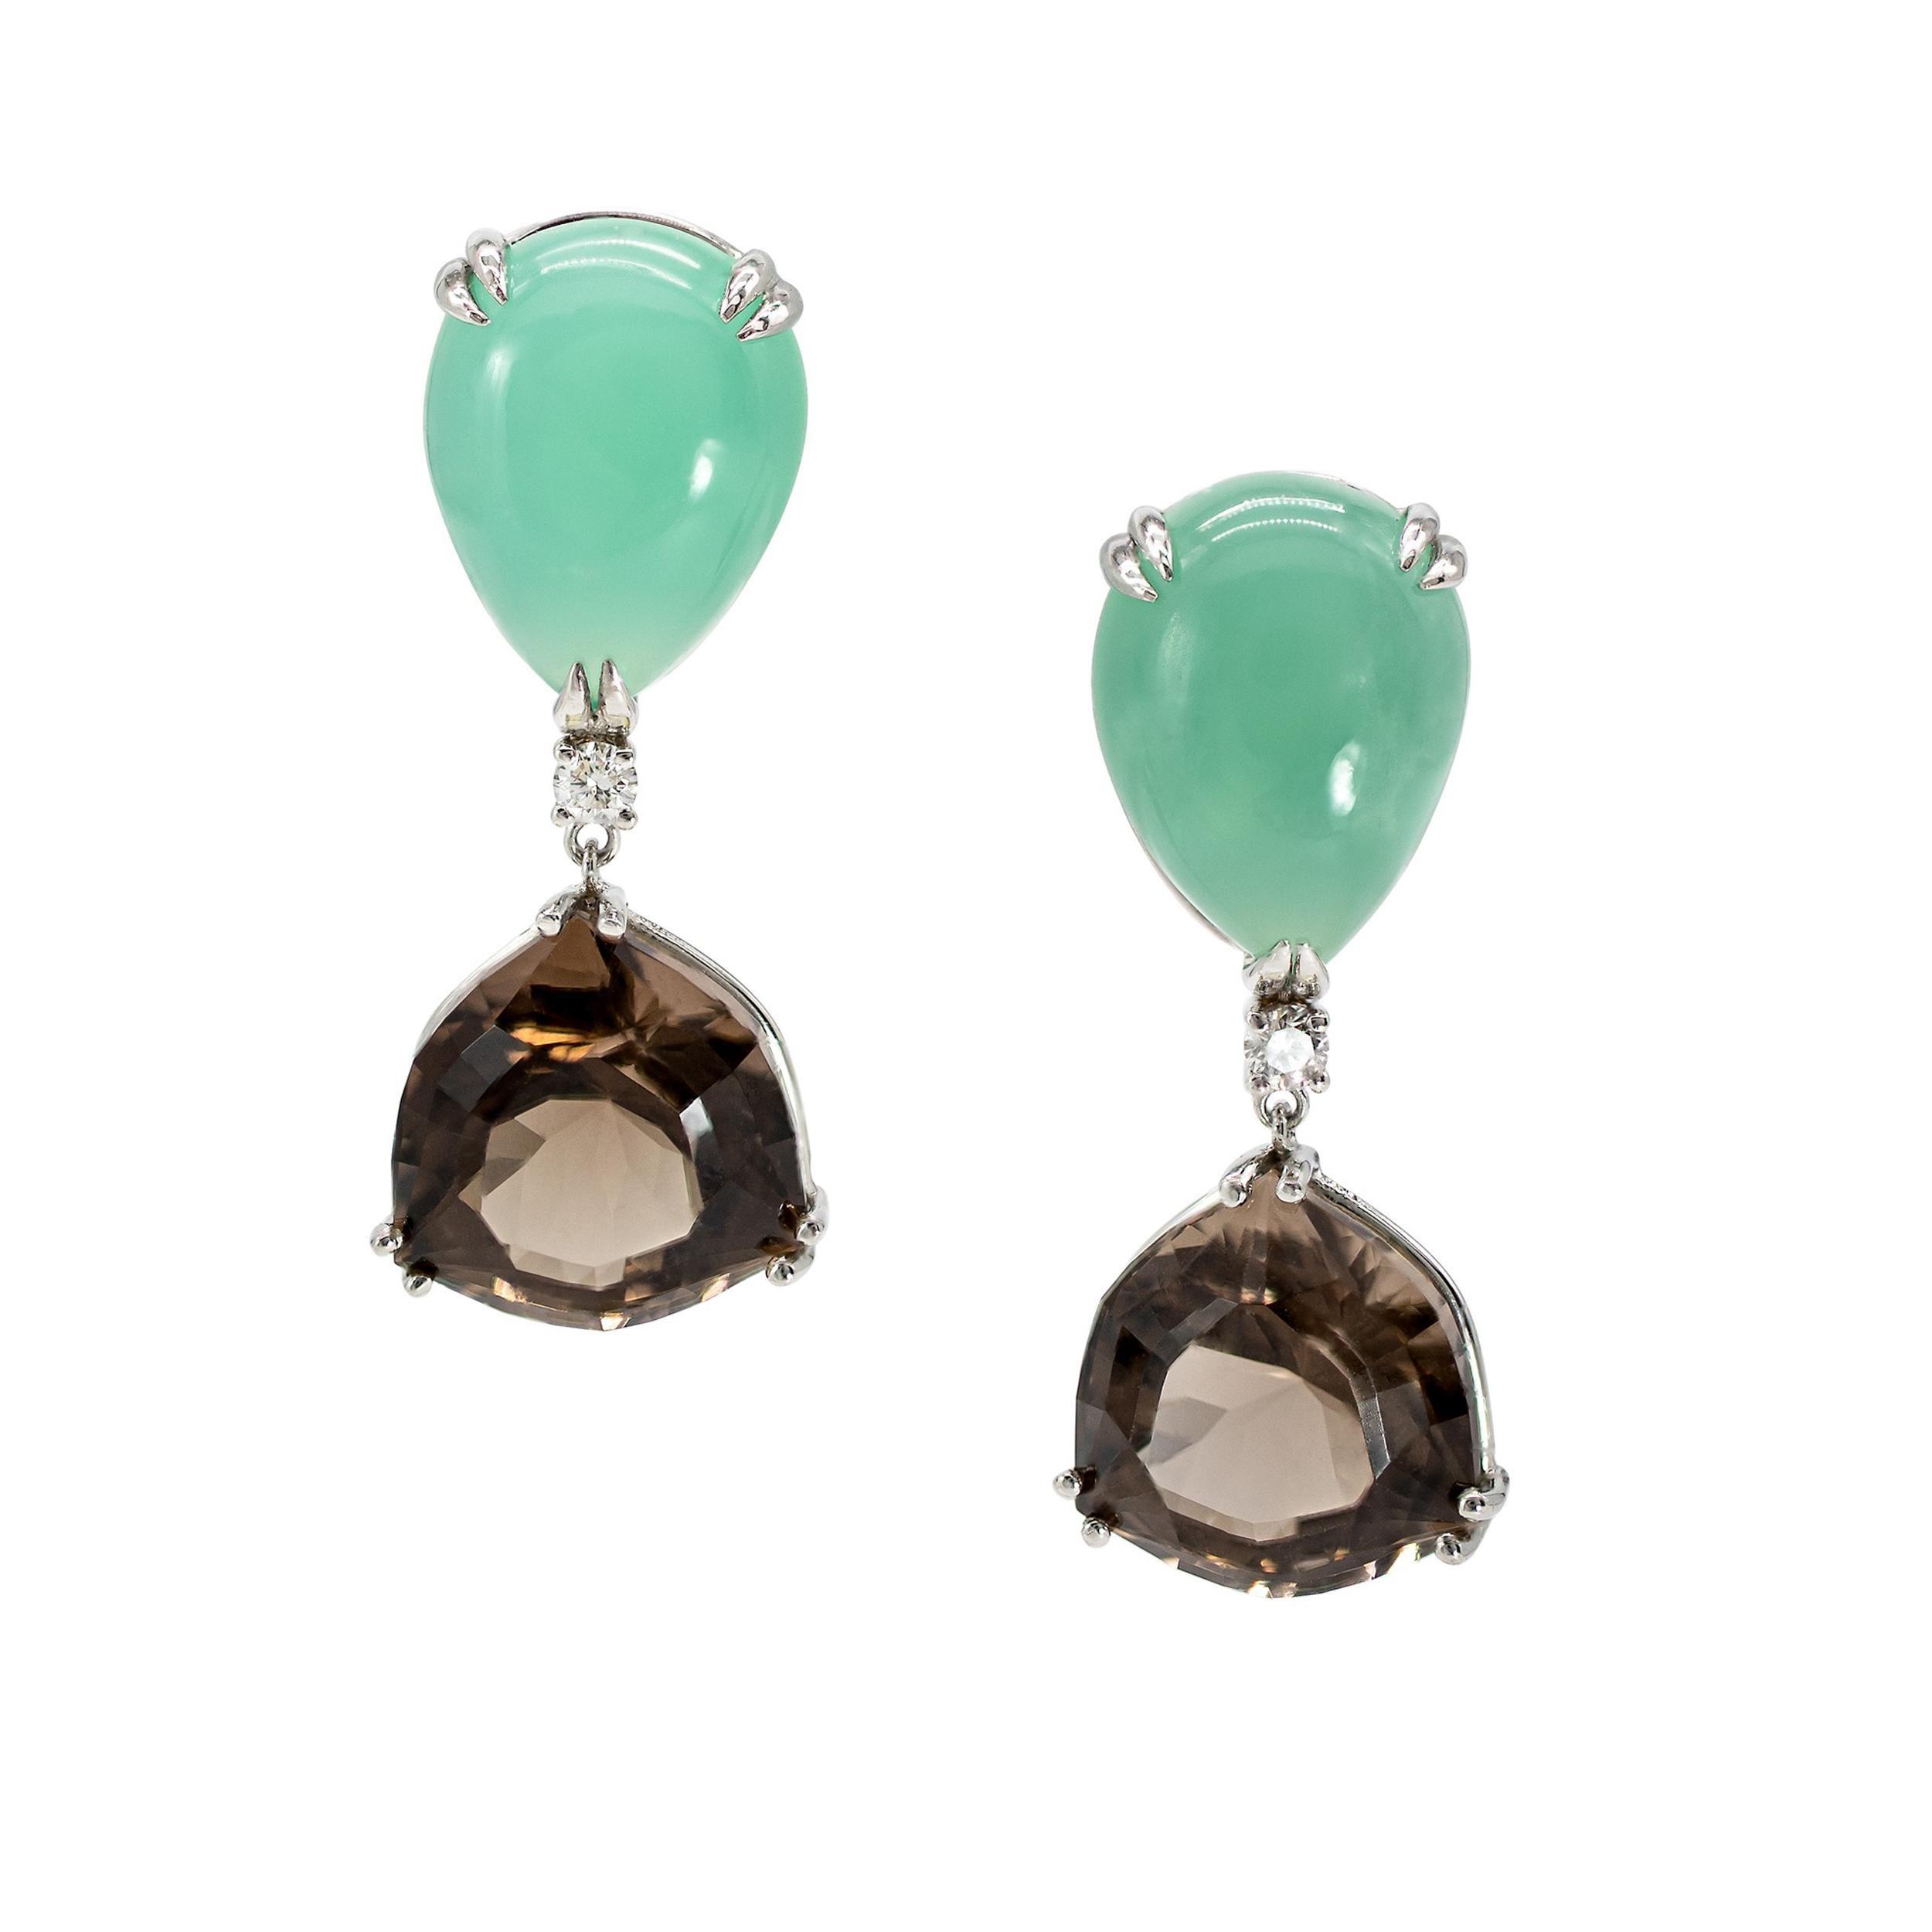 29.60 Carats Chrysoprase, Smoky Quartz, and Diamond Earrings in Platinum